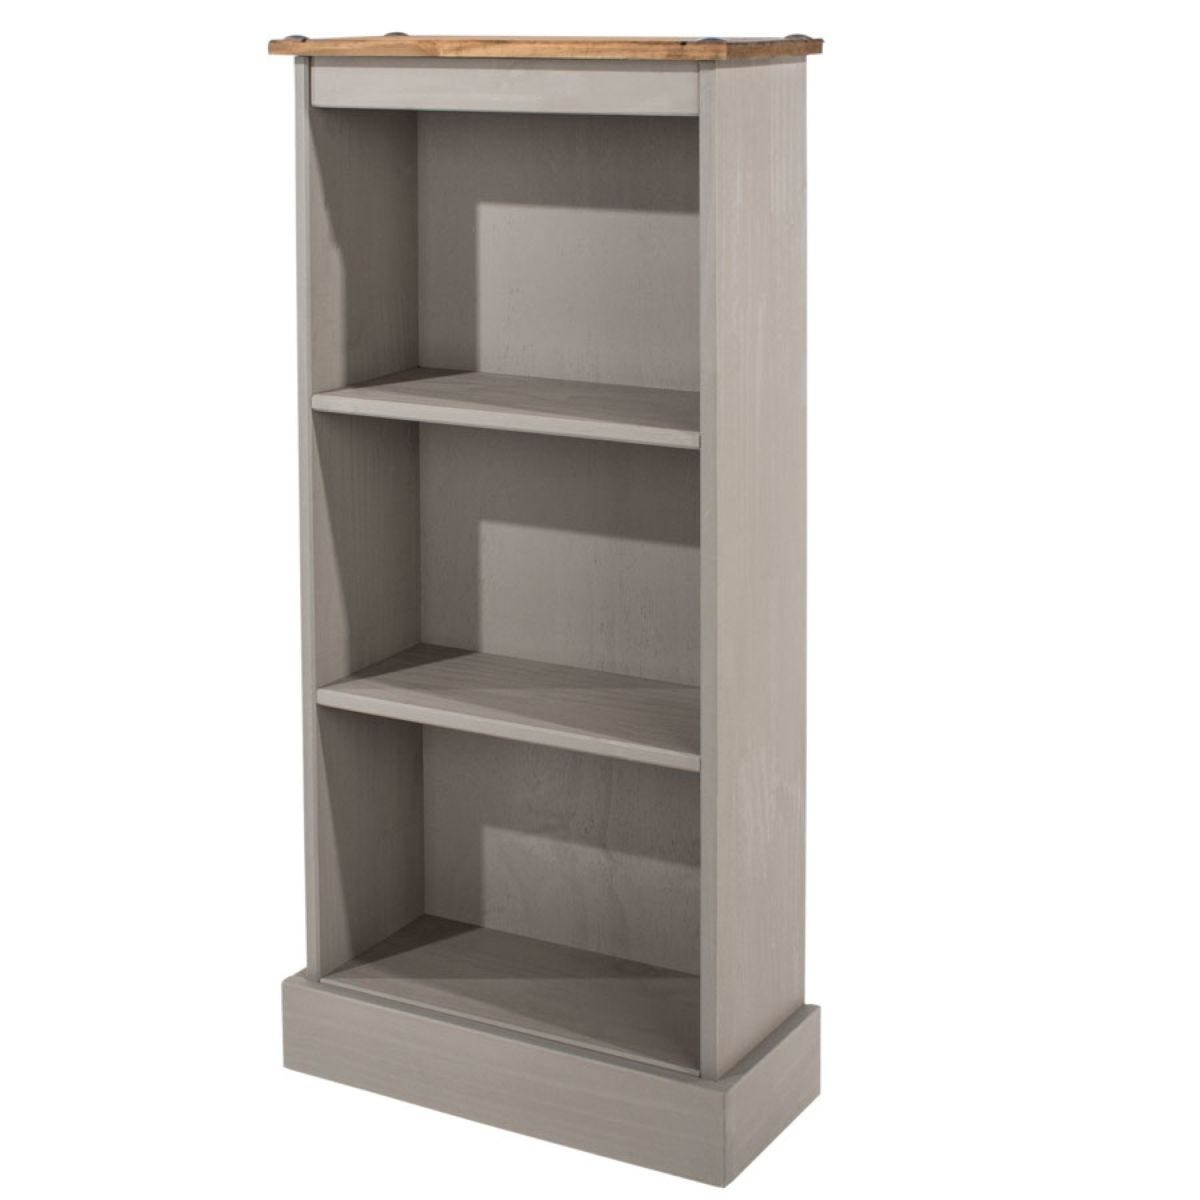 Halea Low Narrow Bookcase - Grey